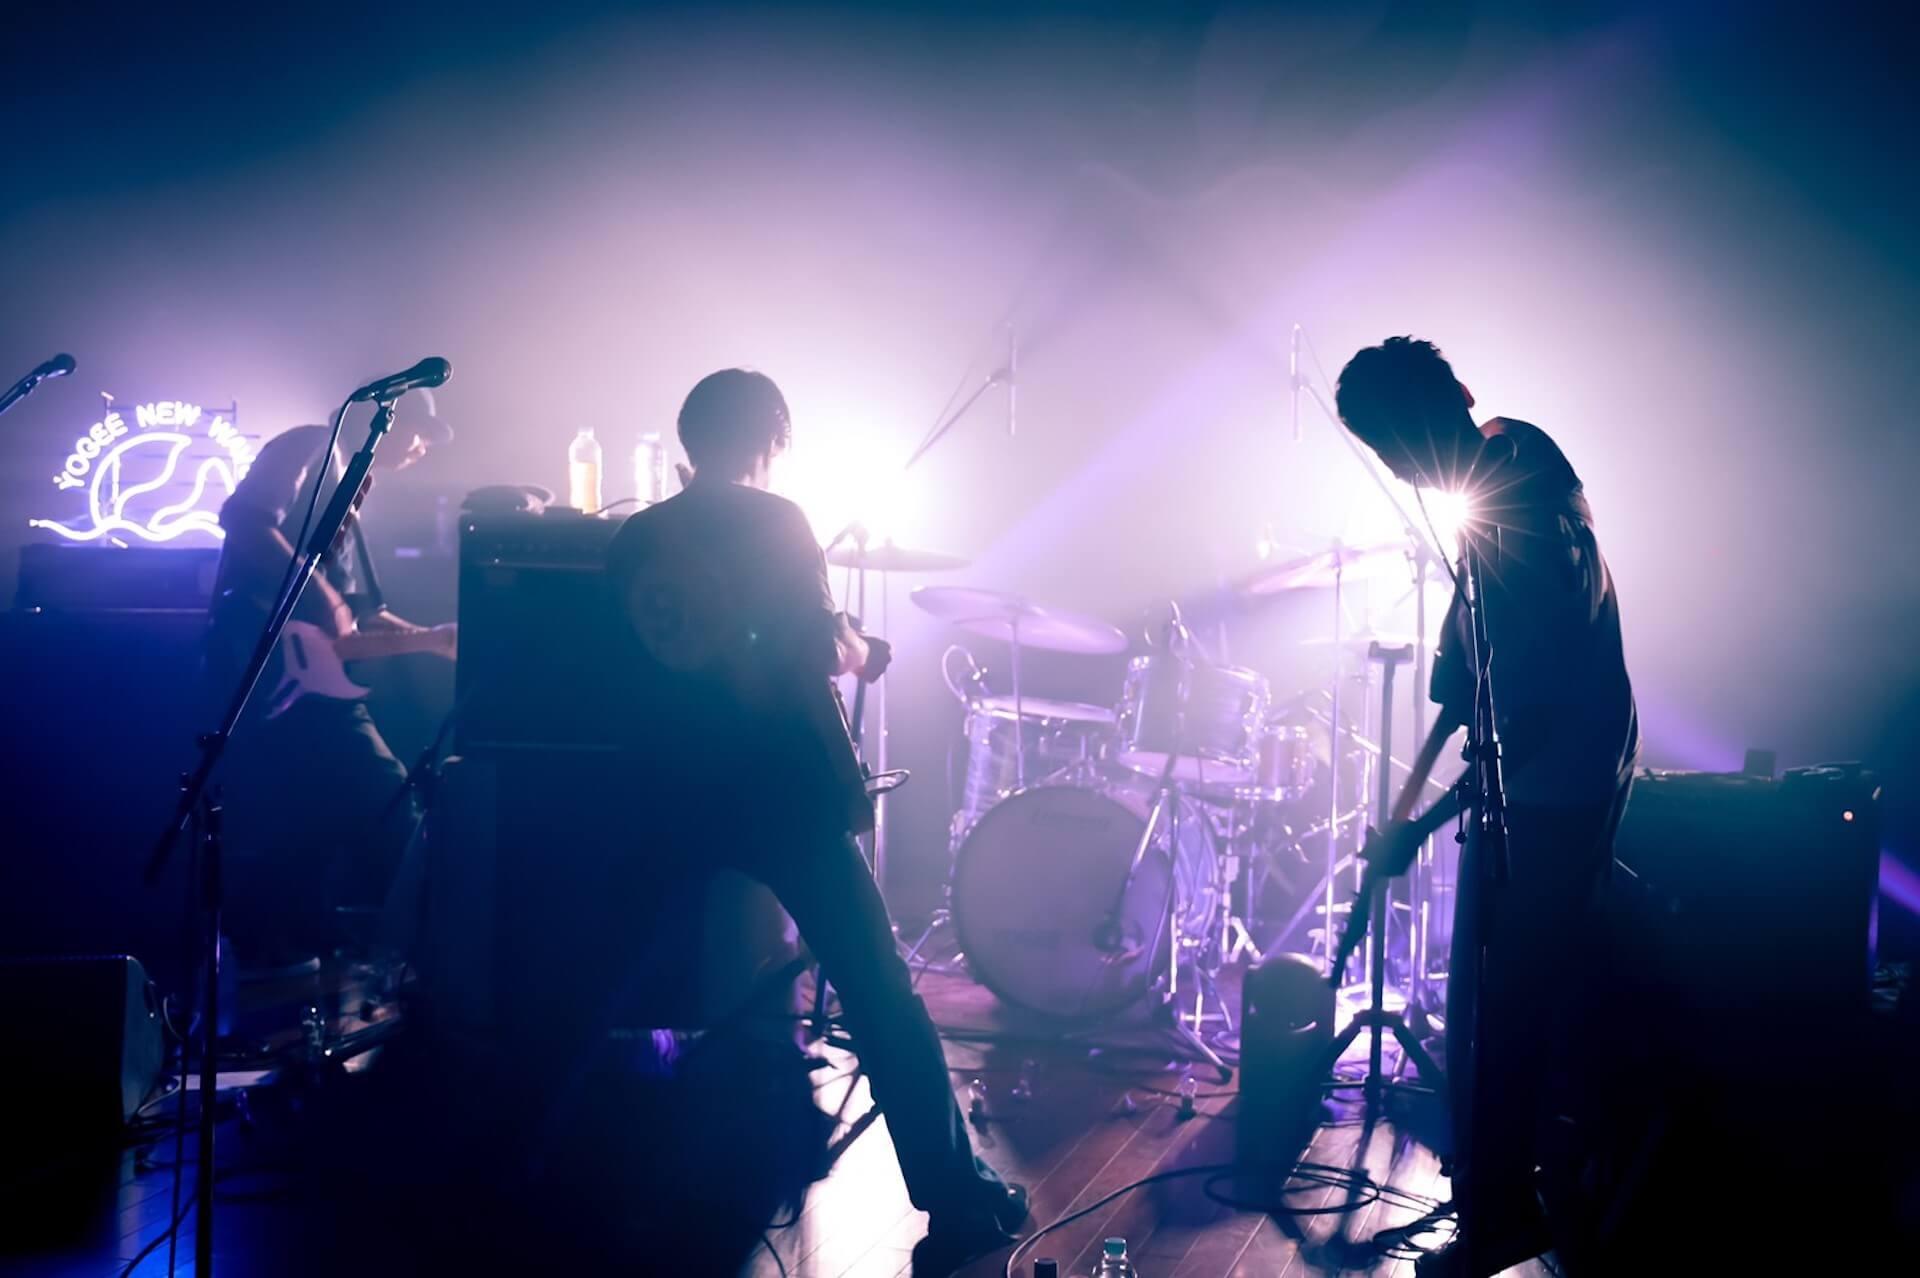 LIVEWIREで配信されたYogee New Wavesのライブ映像が期間限定で見逃し配信中!ライブレポートも到着 music200714_livewire_yogeenewwaves_02